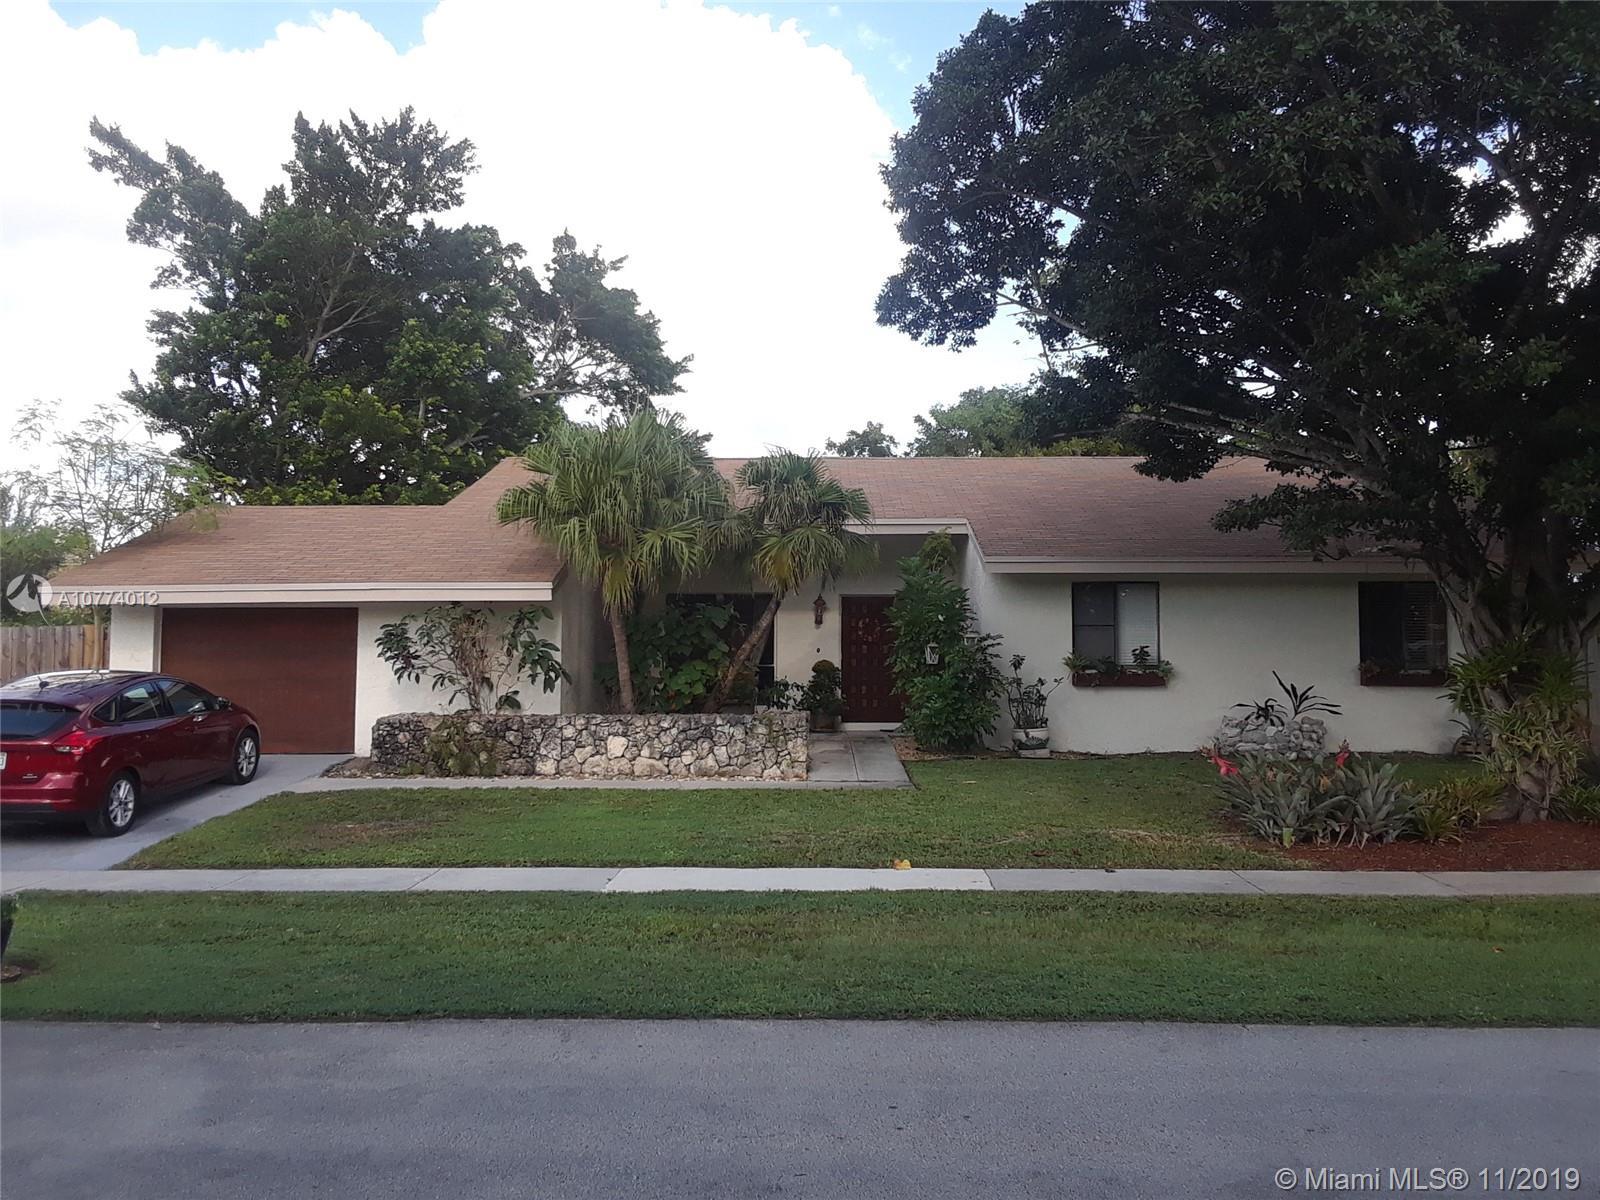 16571 Lake Tree Dr, Weston FL 33326